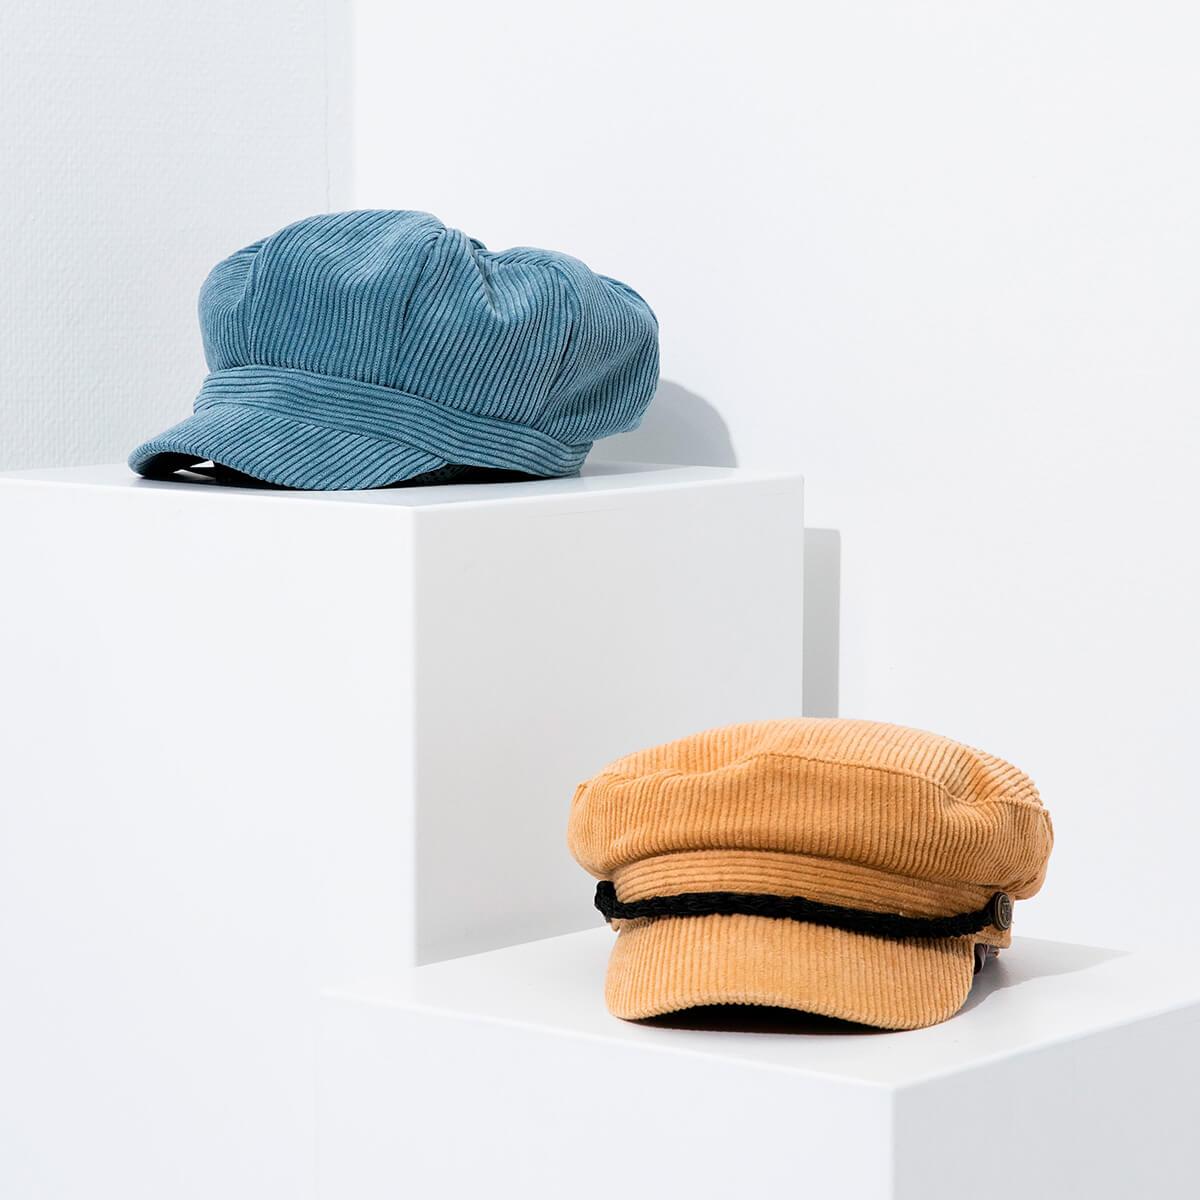 Hoedjes | Wink Accessories | Groothandel kleding